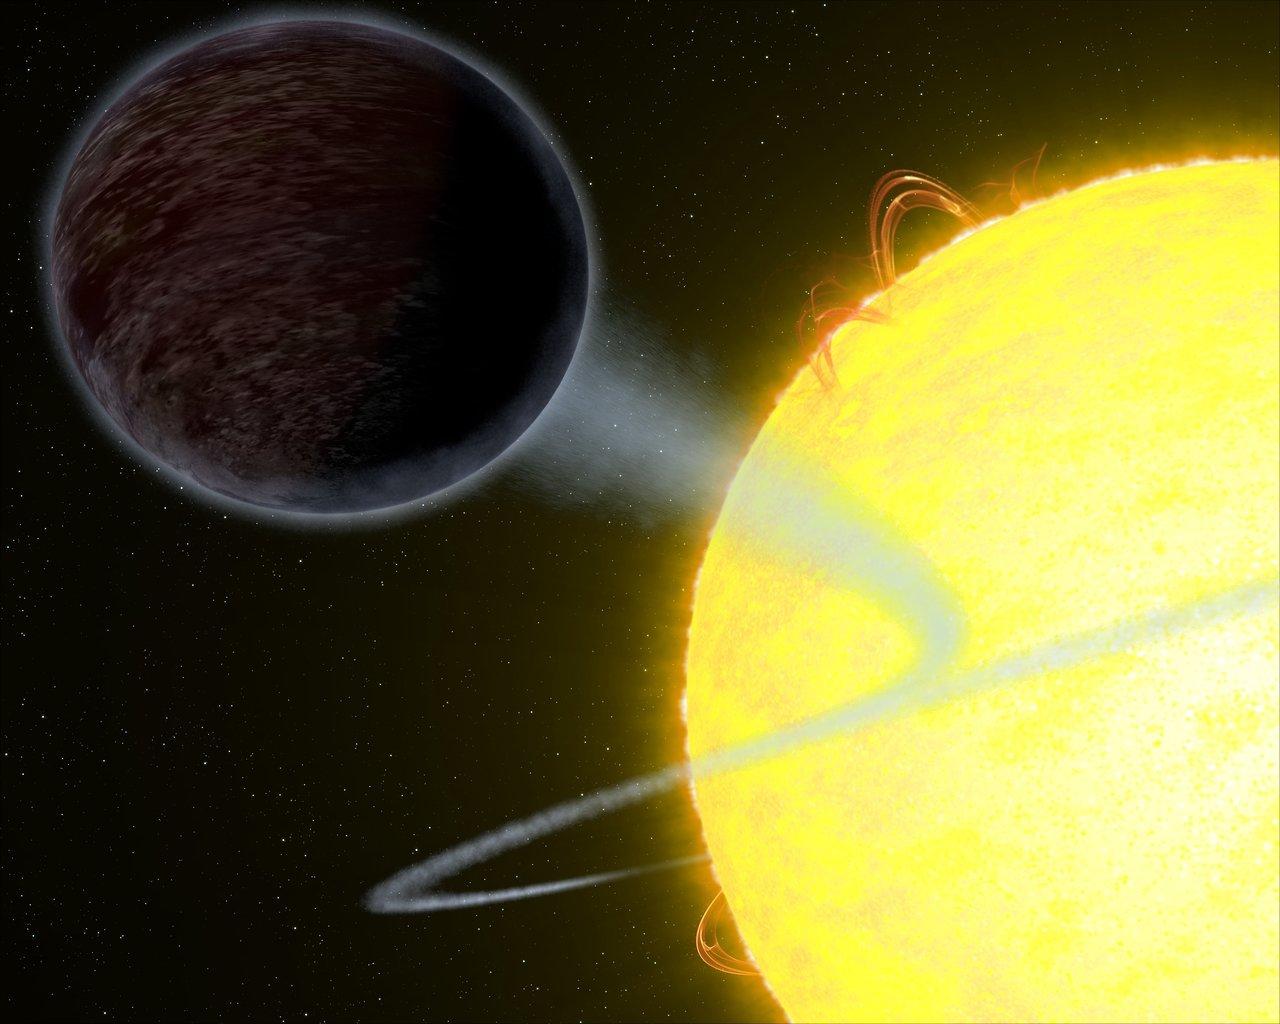 Image link:  https://exoplanets.nasa.gov/news/1456/nasas-hubble-captures-blistering-pitch-black-planet/